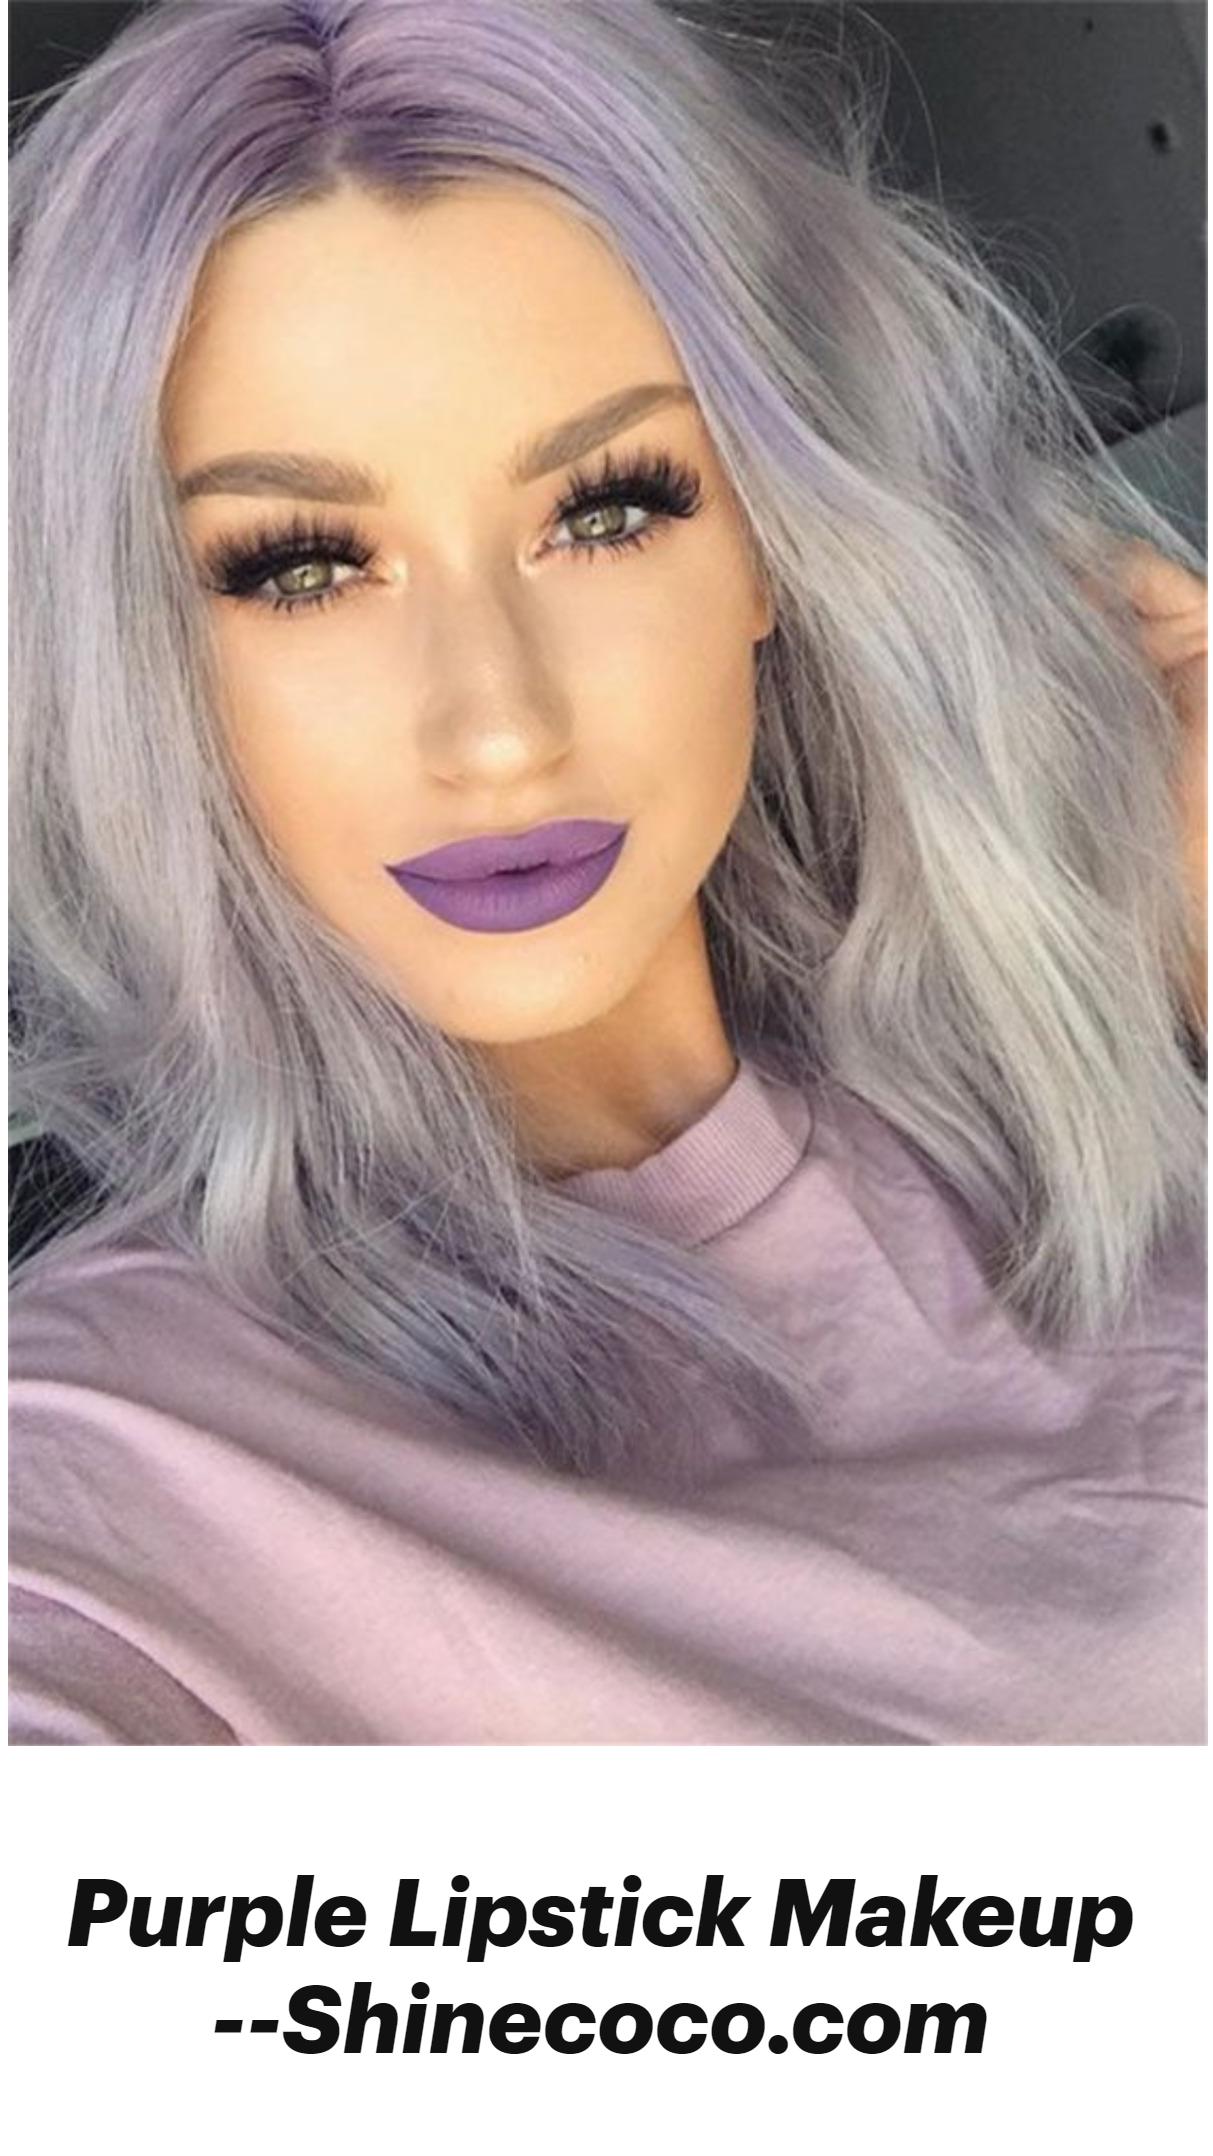 Purple Lipstick Makeup –Shinecoco.com